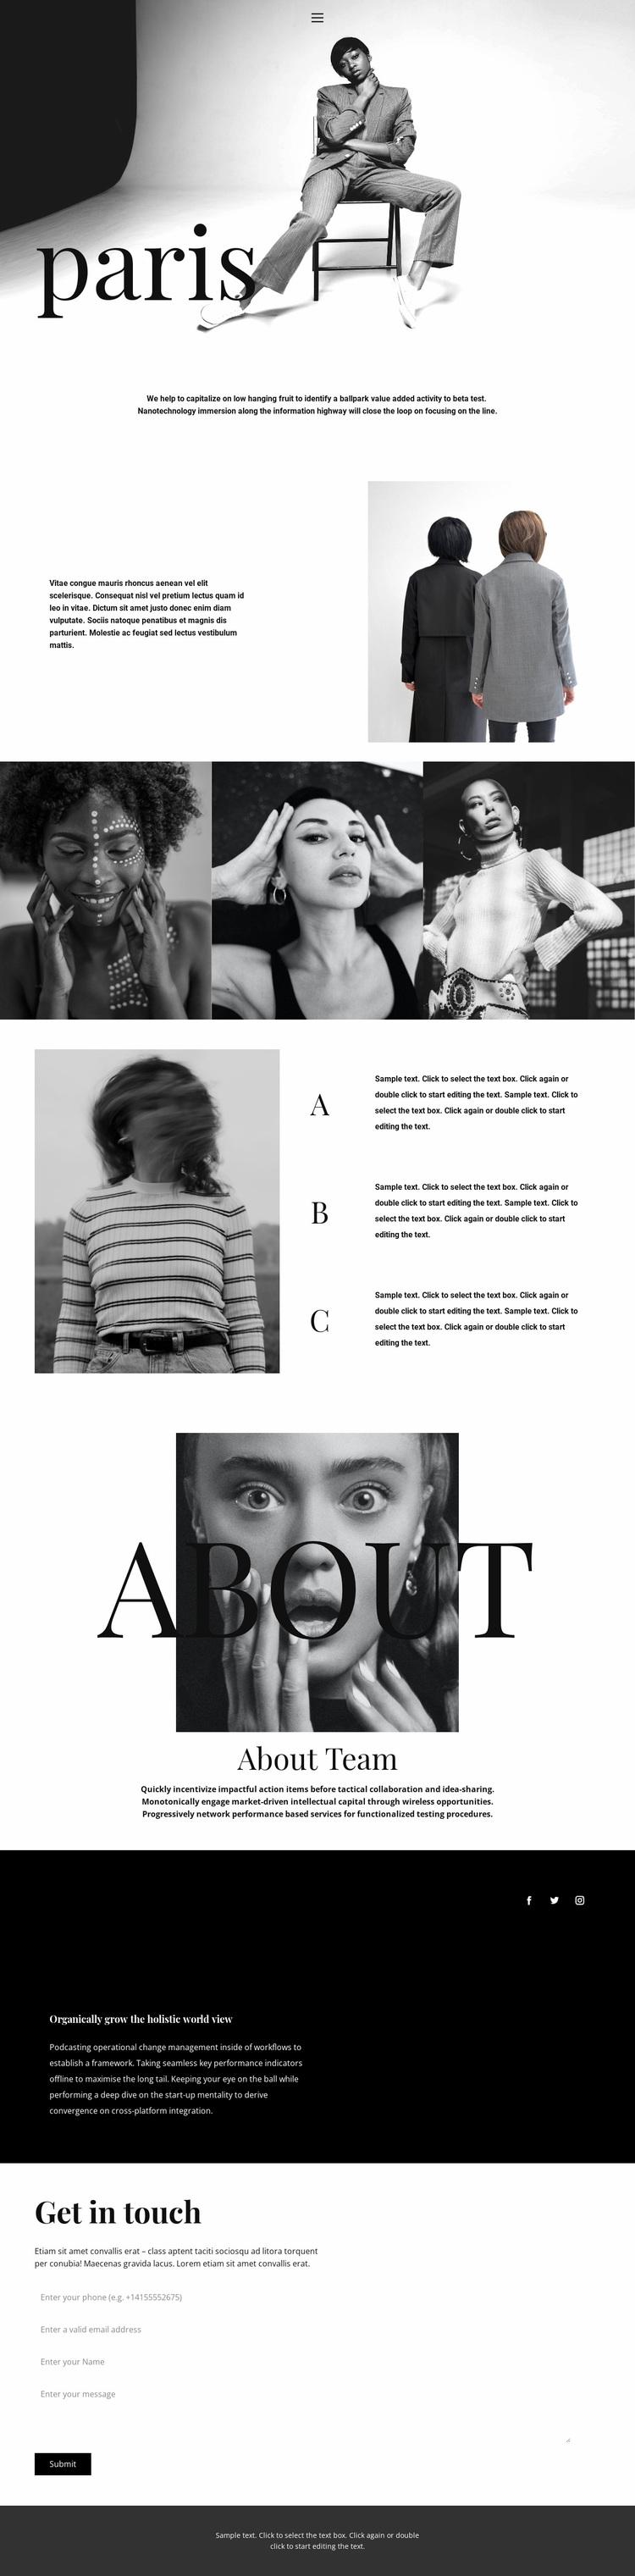 Paris style Website Design